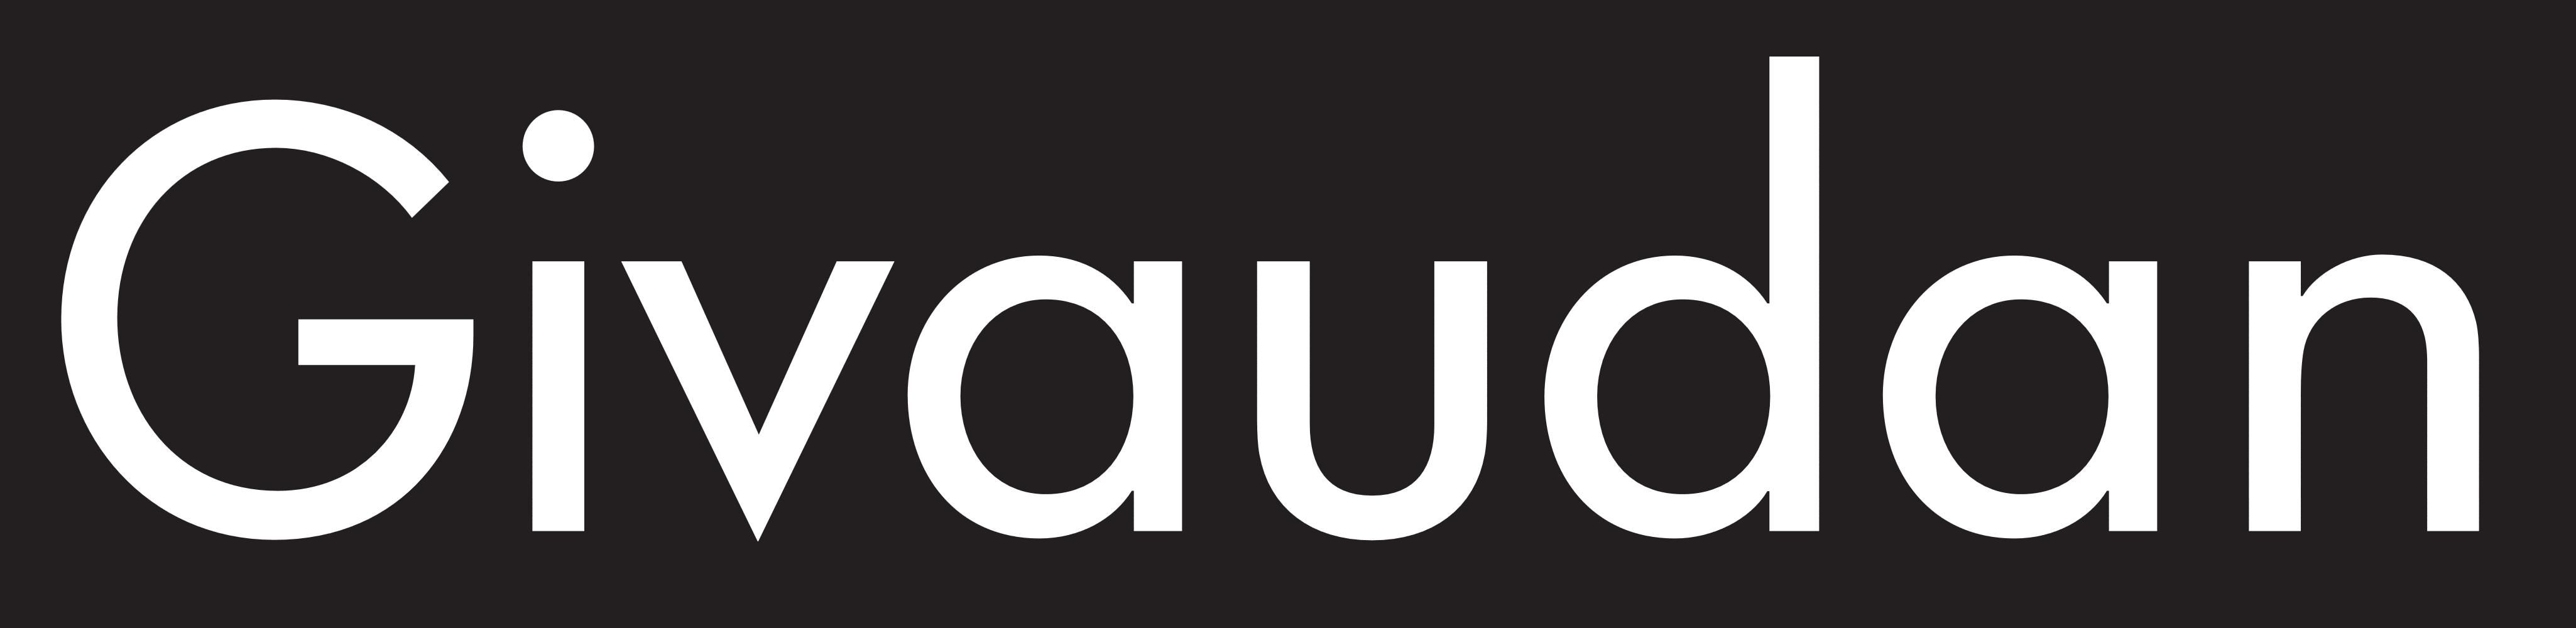 Givaudan – Logos Download